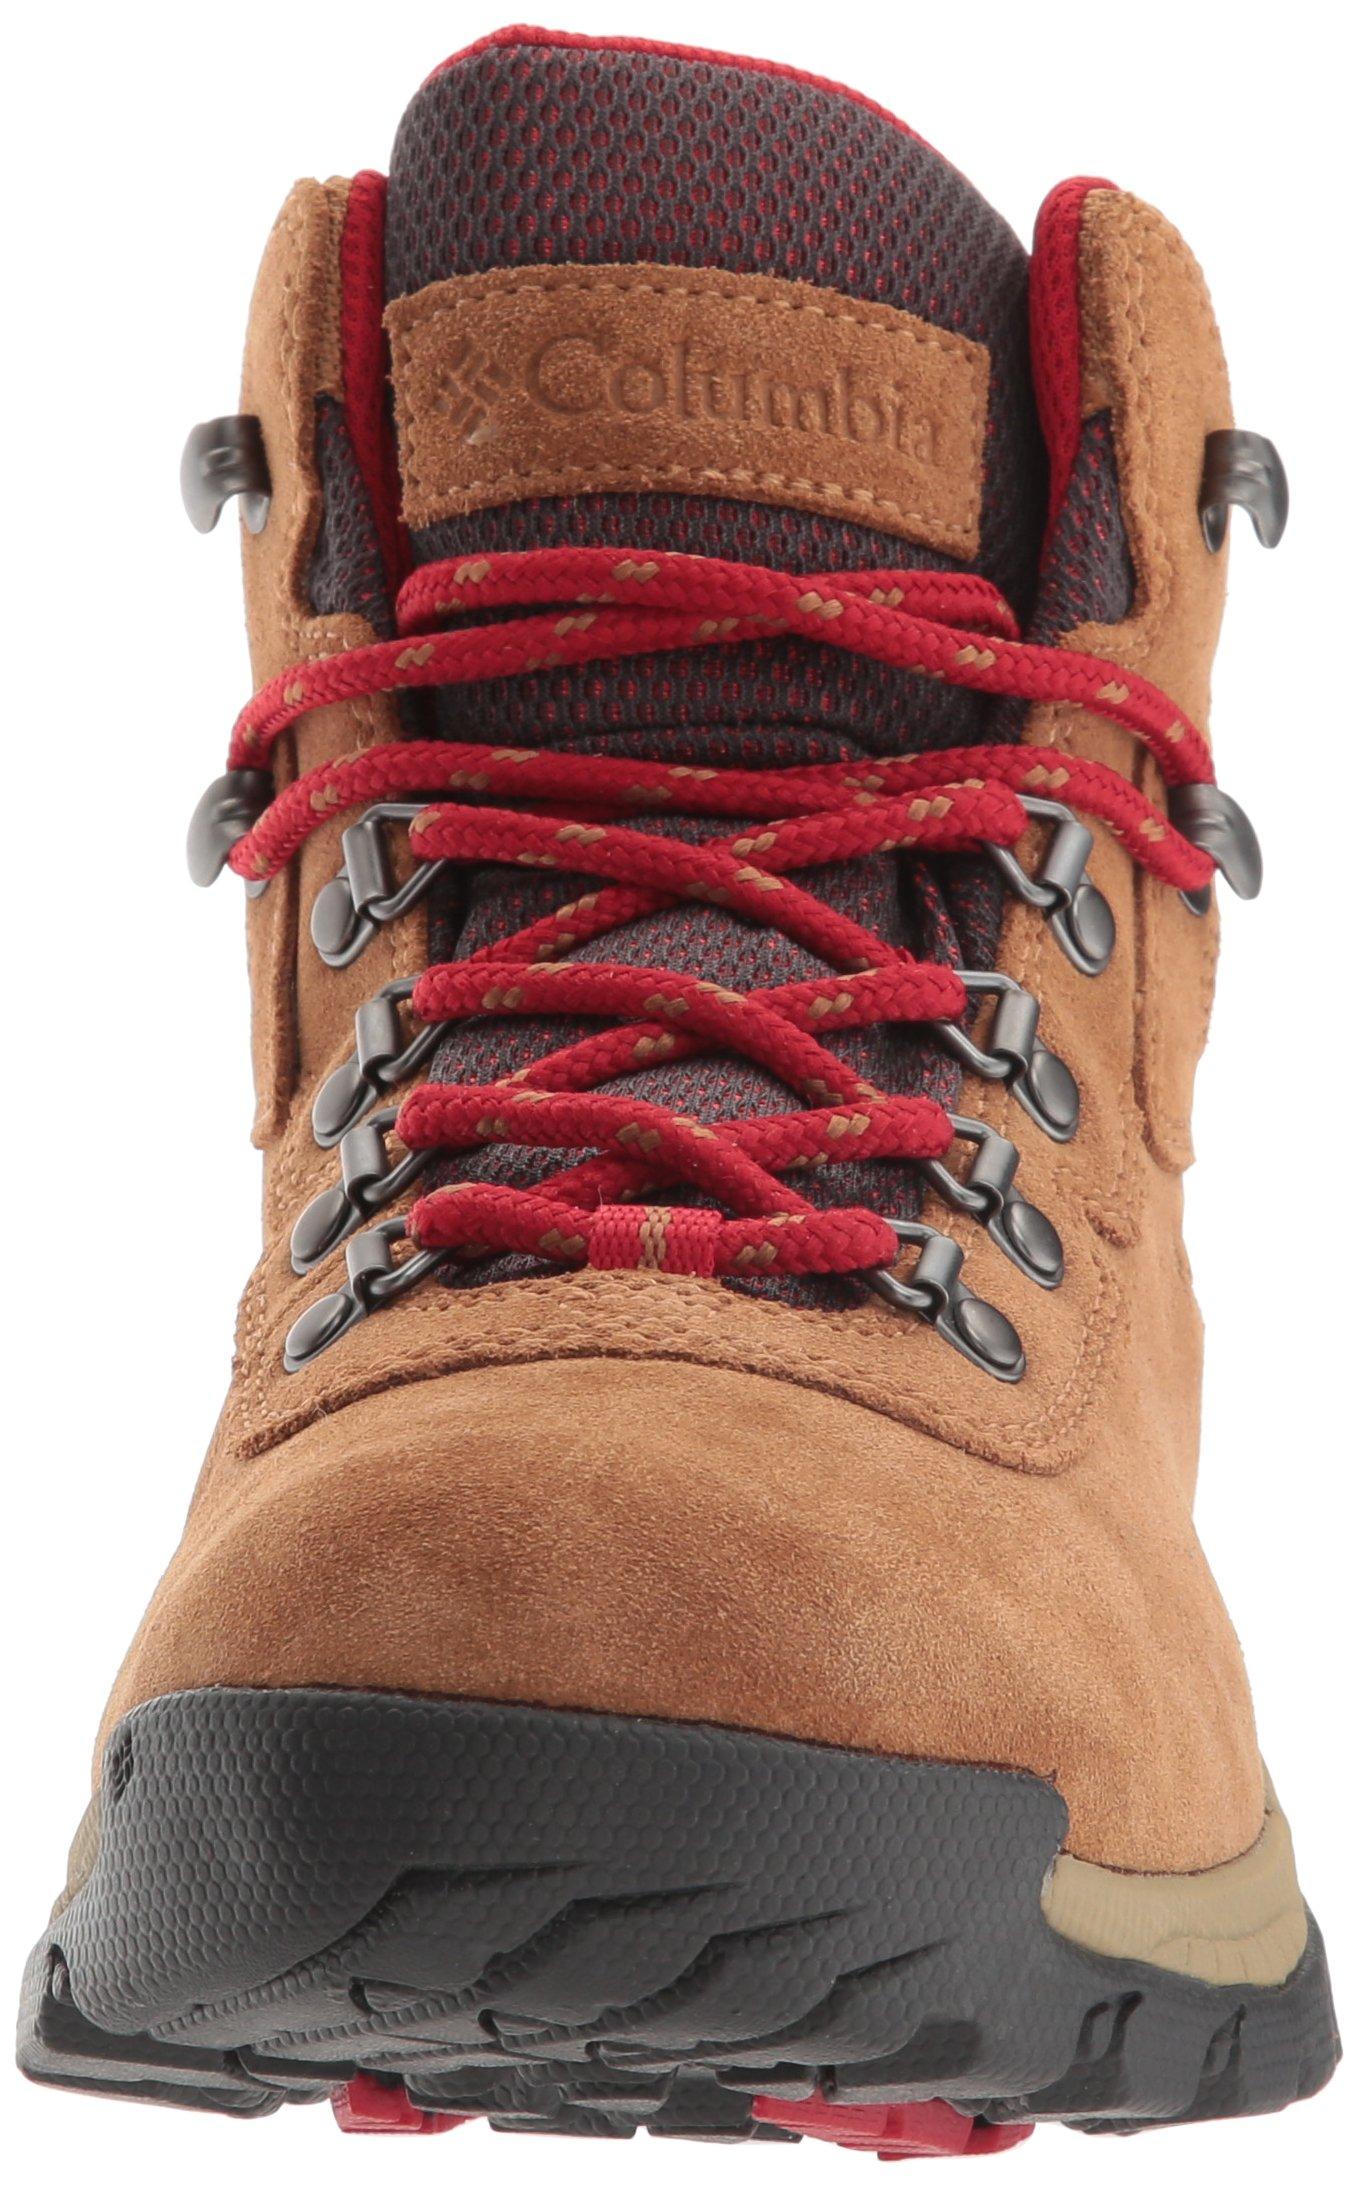 Columbia Women's Newton Ridge Plus Waterproof Amped Hiking Boot, Elk, Mountain Red, 7.5 B US by Columbia (Image #4)